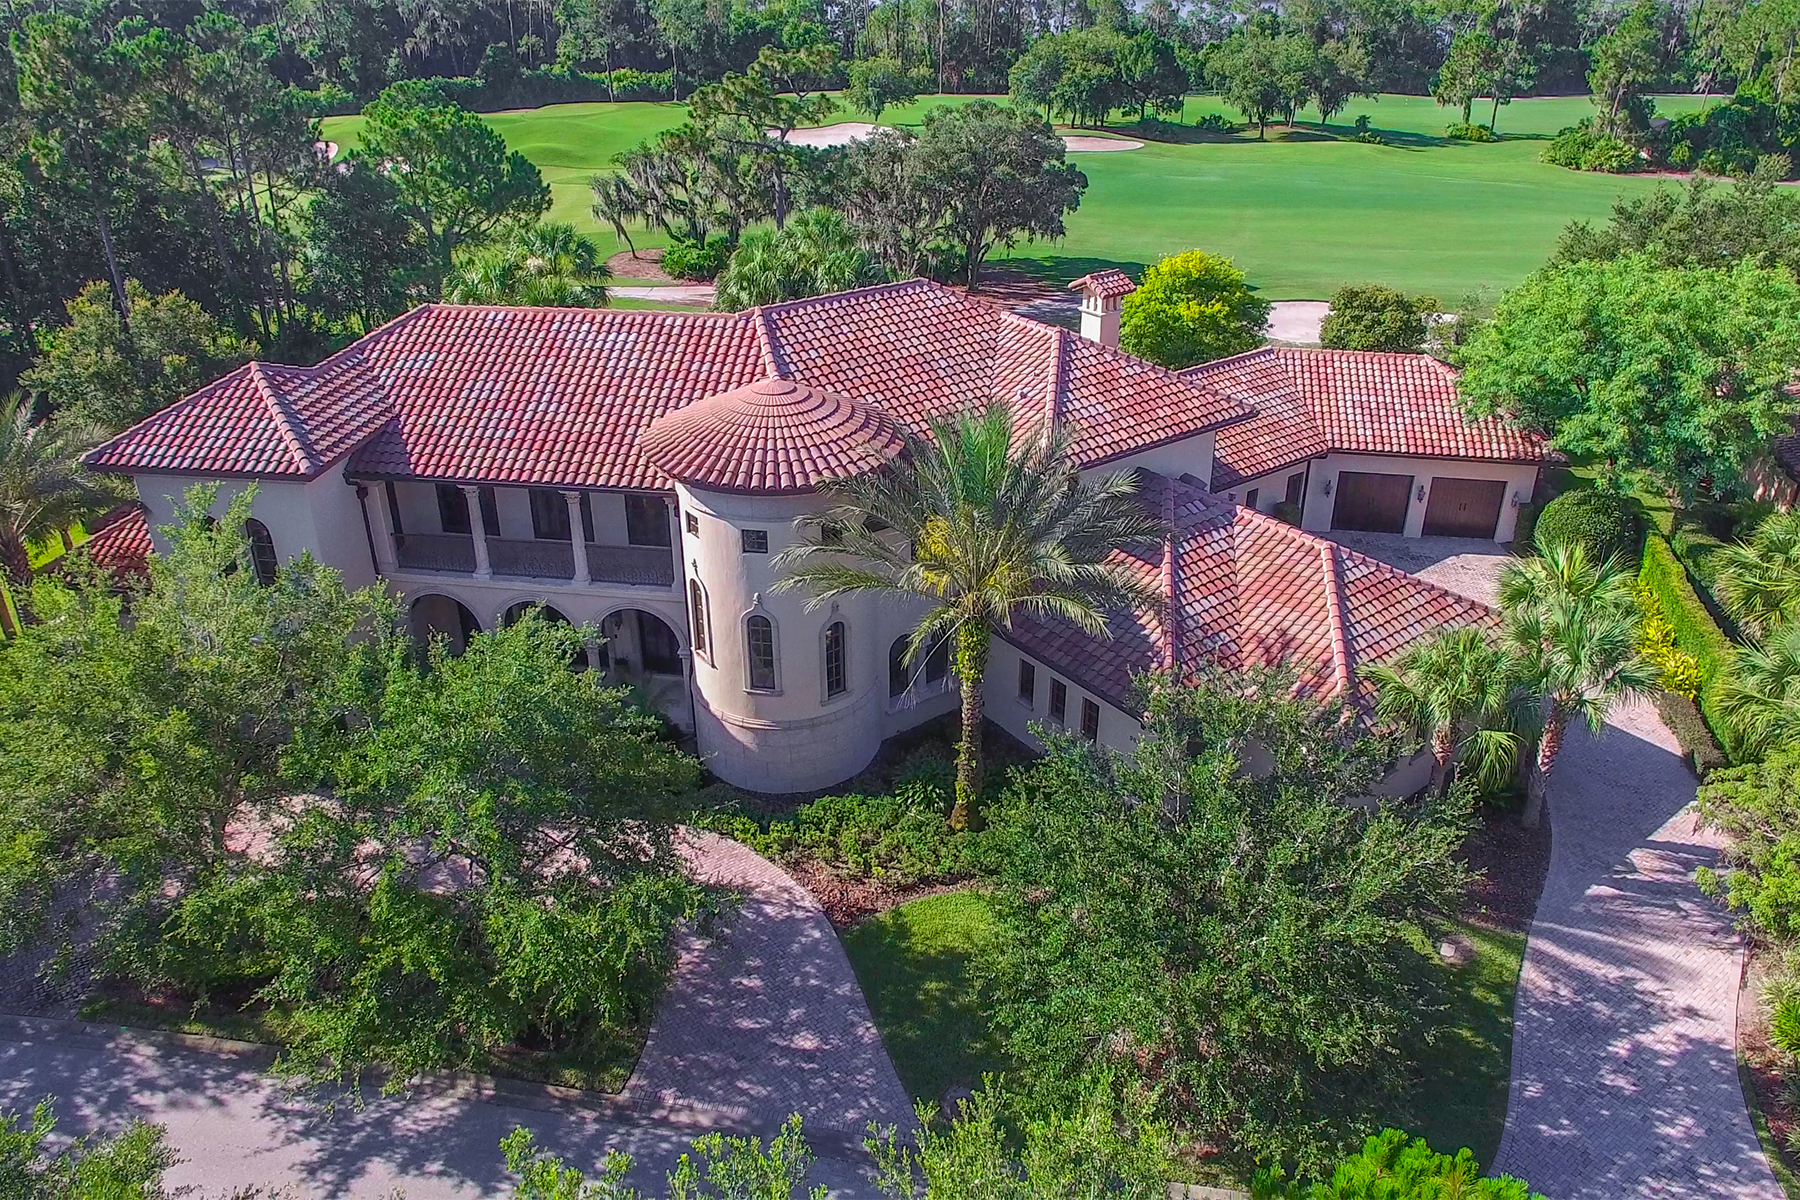 Casa Unifamiliar por un Venta en LAKE NONA 9680 Sloane St Orlando, Florida, 32827 Estados Unidos